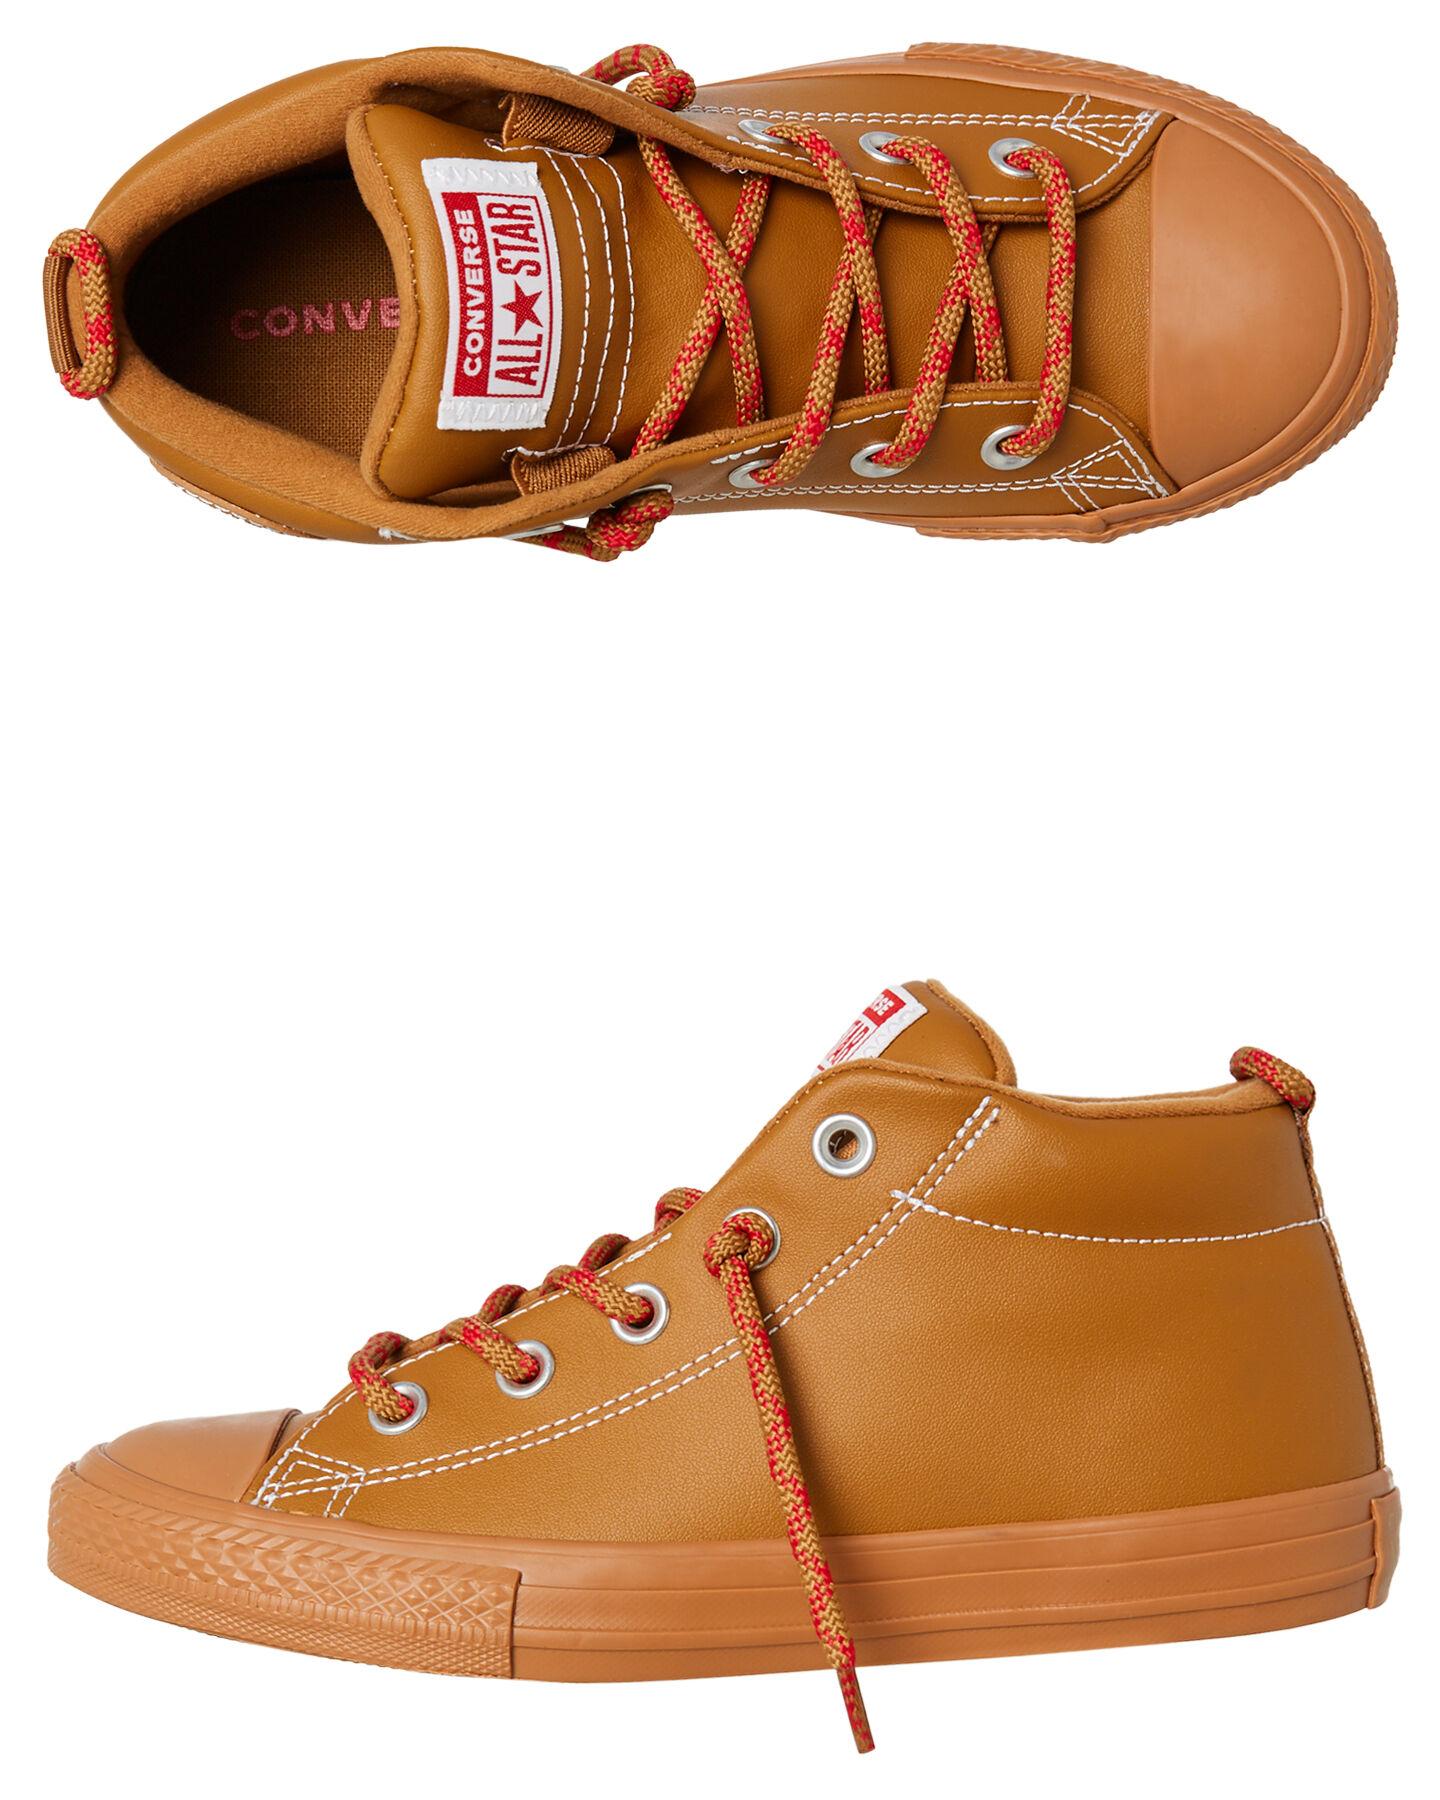 6edee3dcfbd854 ... clearance burnt caramel kids boys converse sneakers 662310cara ece39  f5869